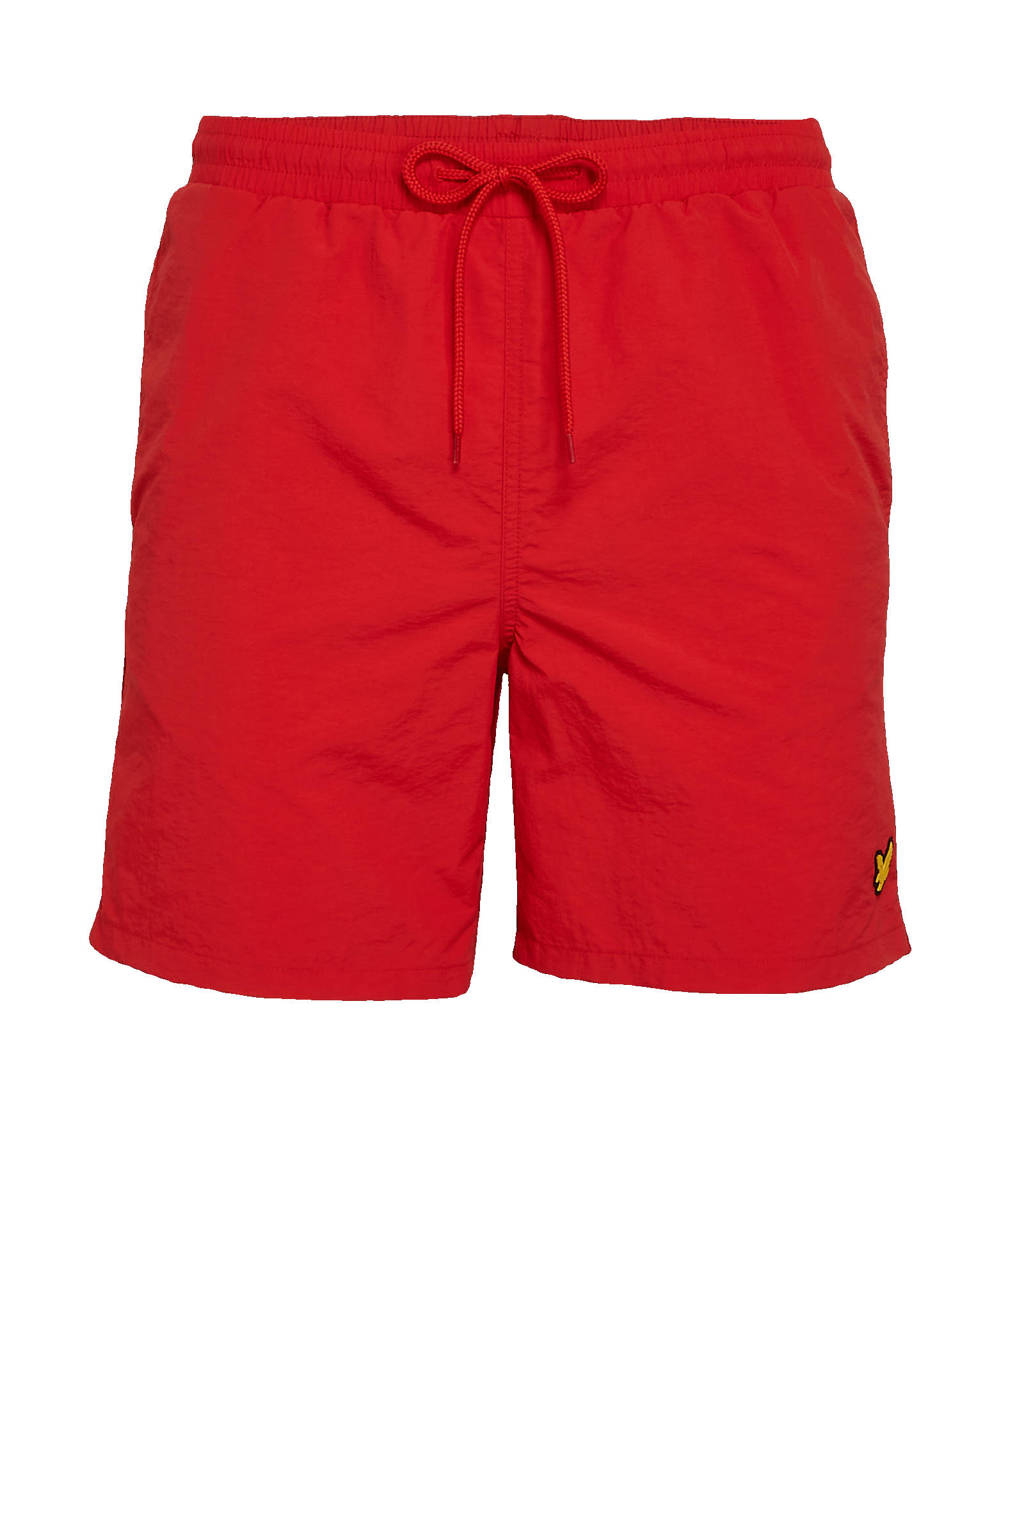 Lyle & Scott zwemshort rood, Rood